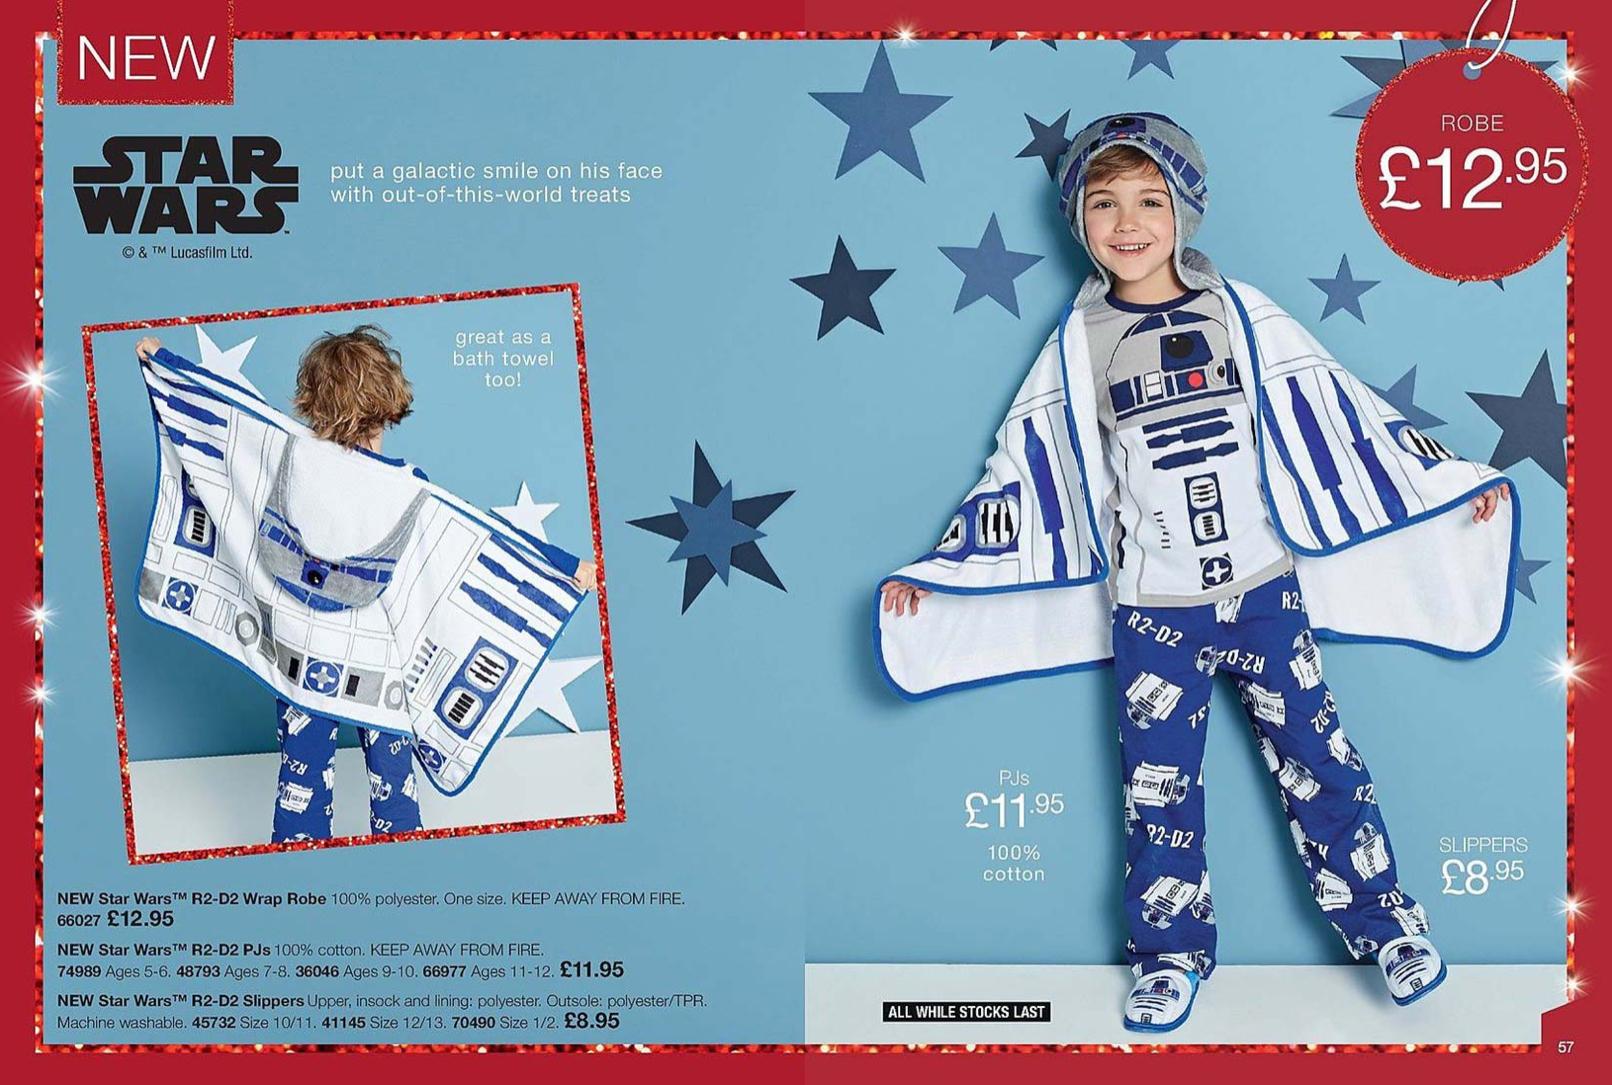 Avon UK Brochure 1 2019 Star Wars Gifts